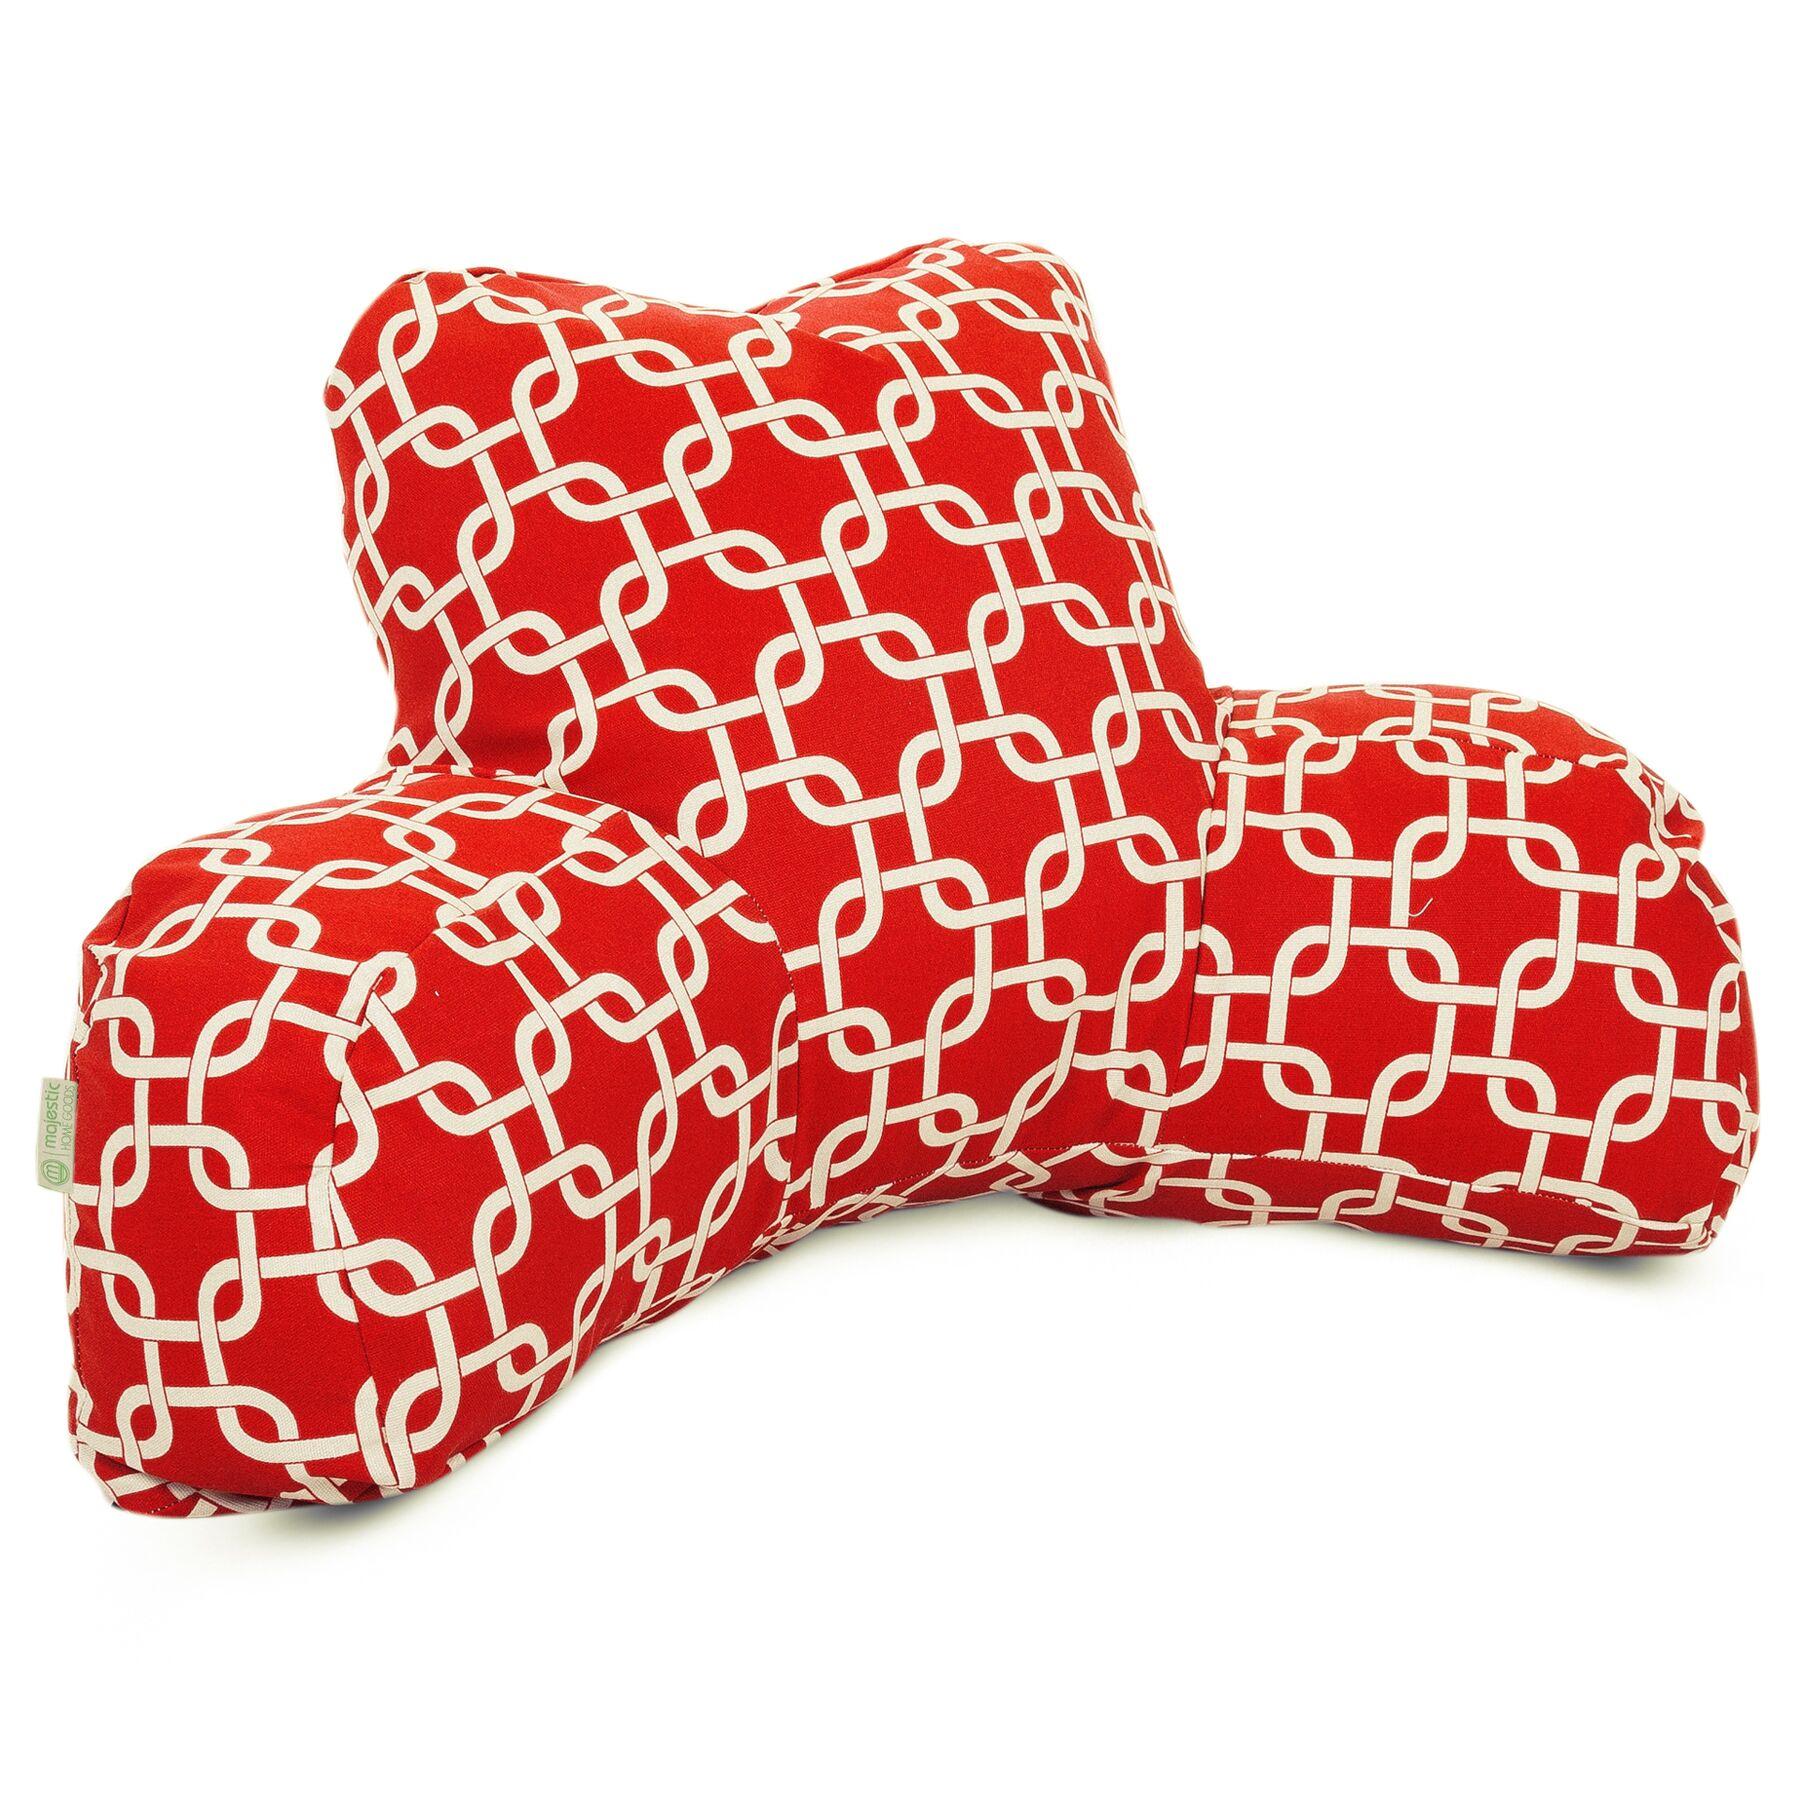 Banas Indoor/Outdoor Bed Rest Pillow Color: Red